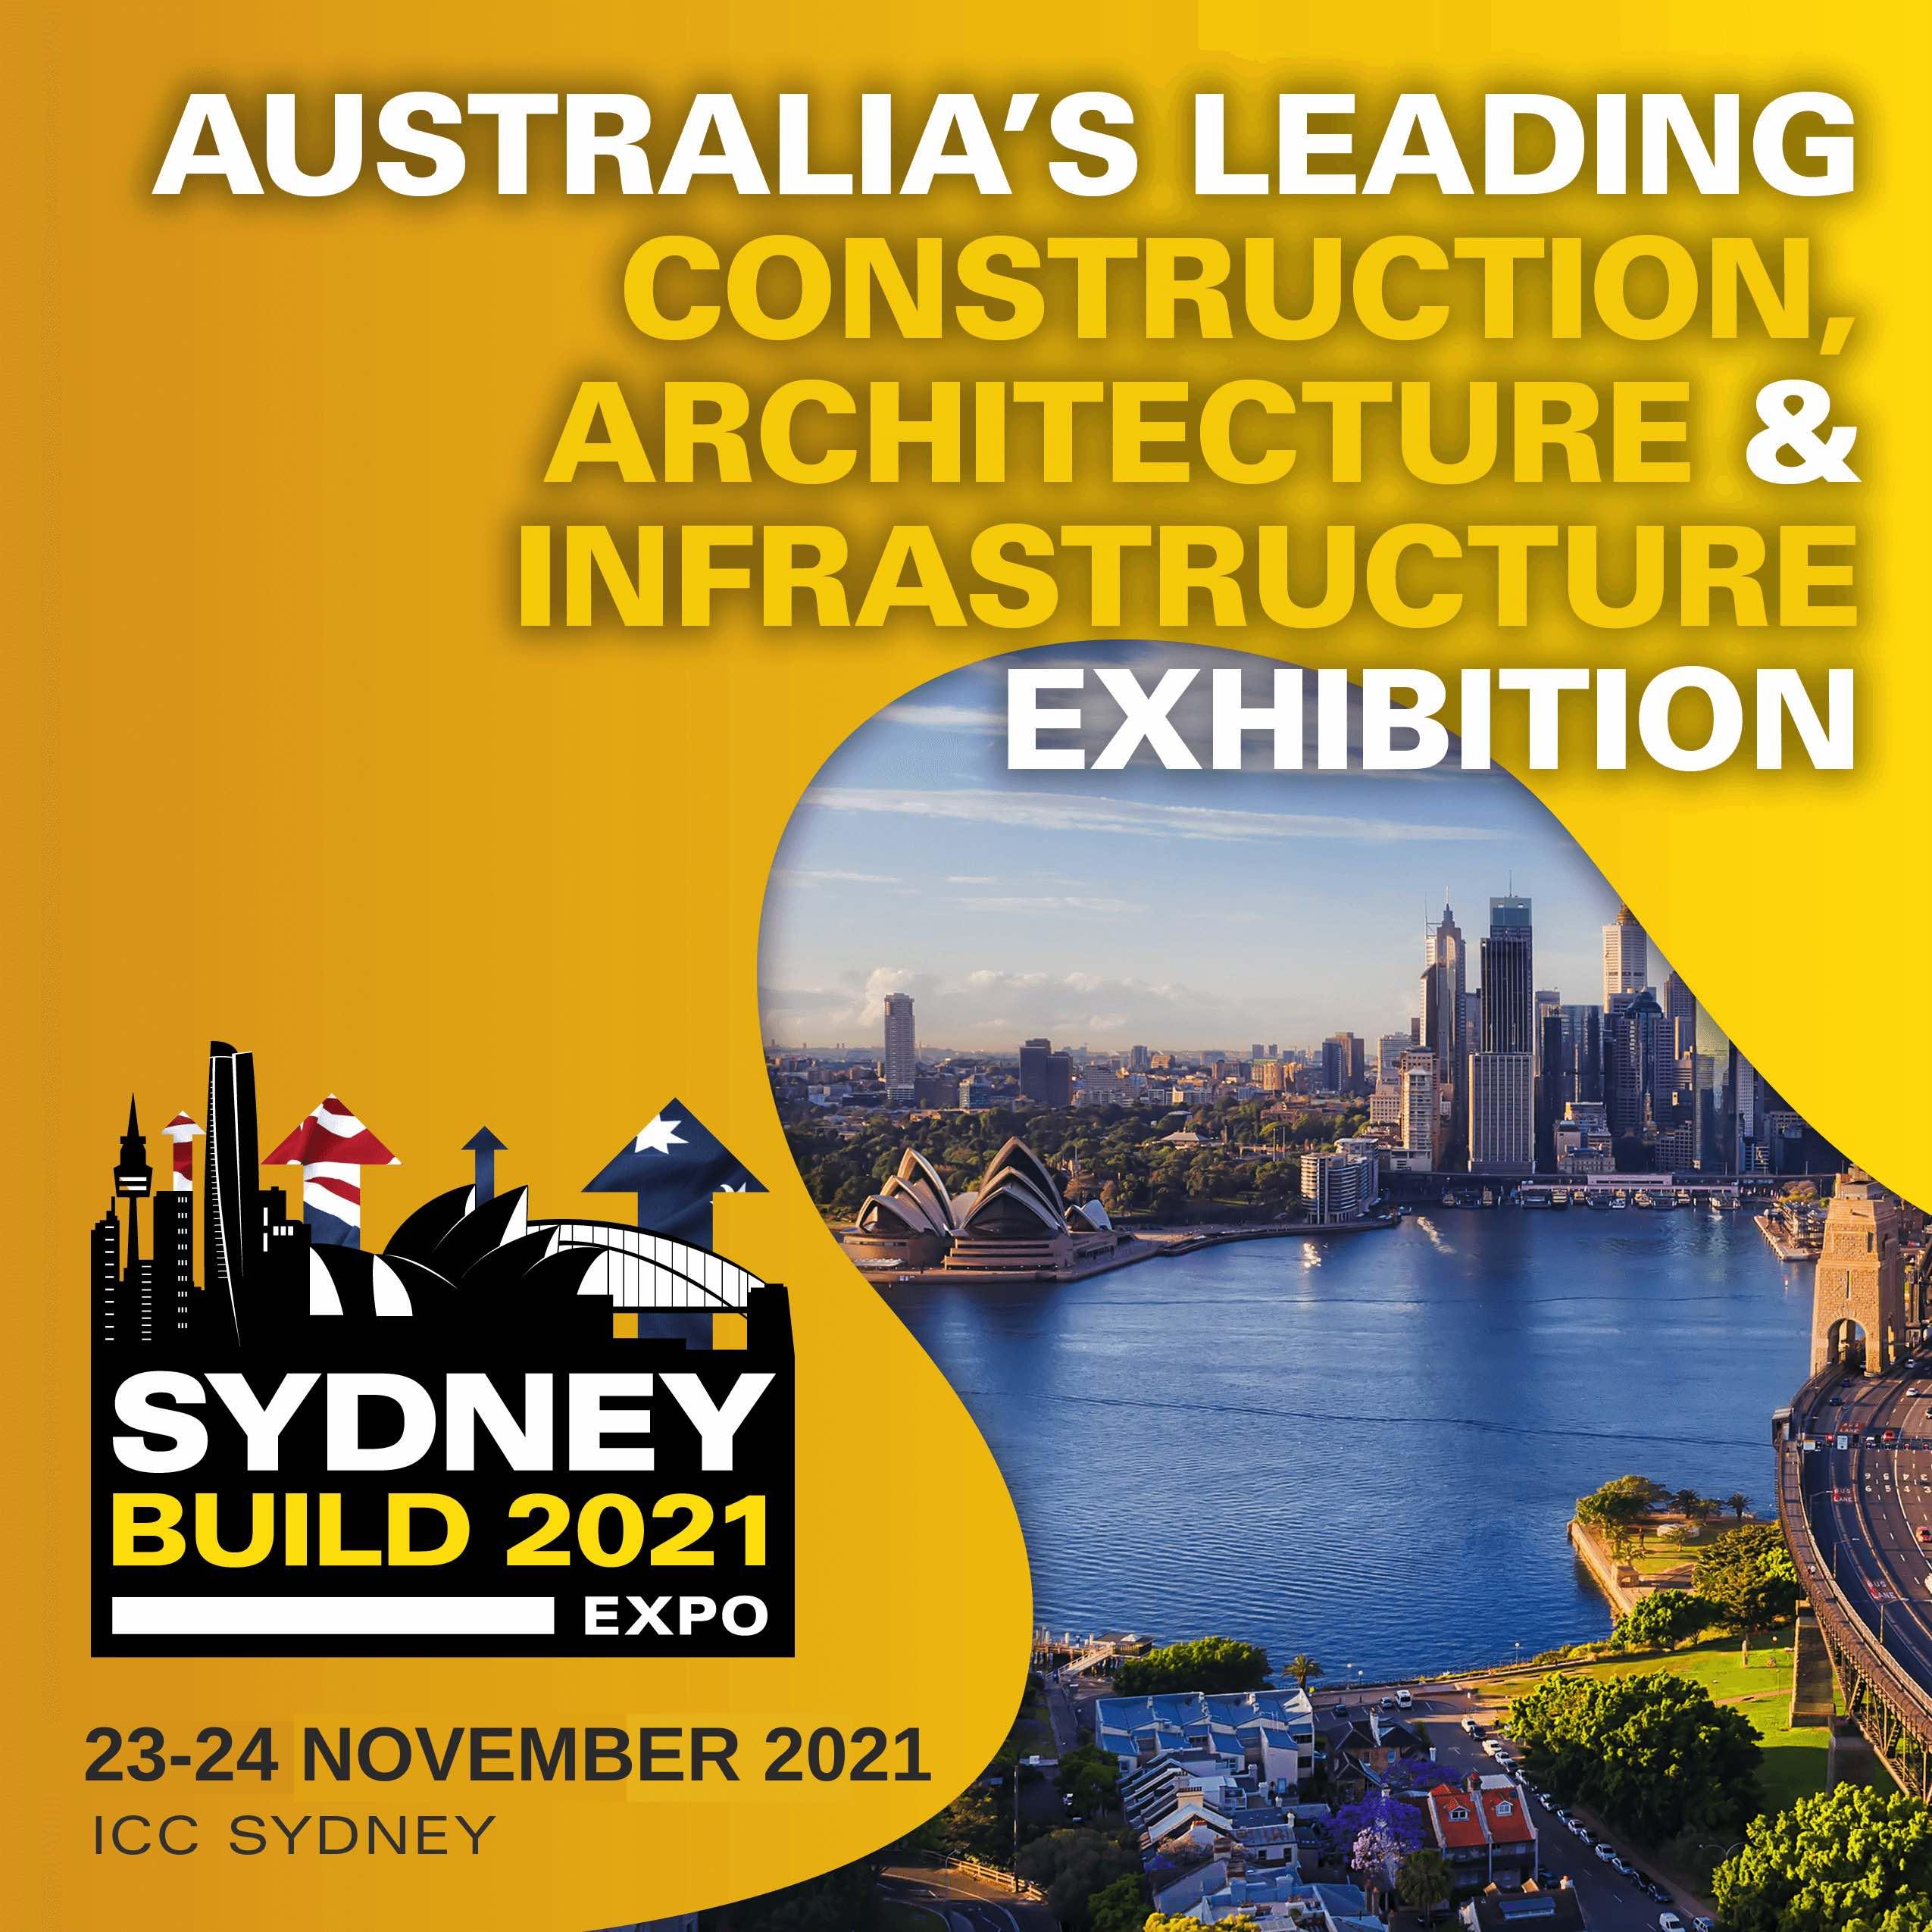 Sydney Build 2021 2550x2550